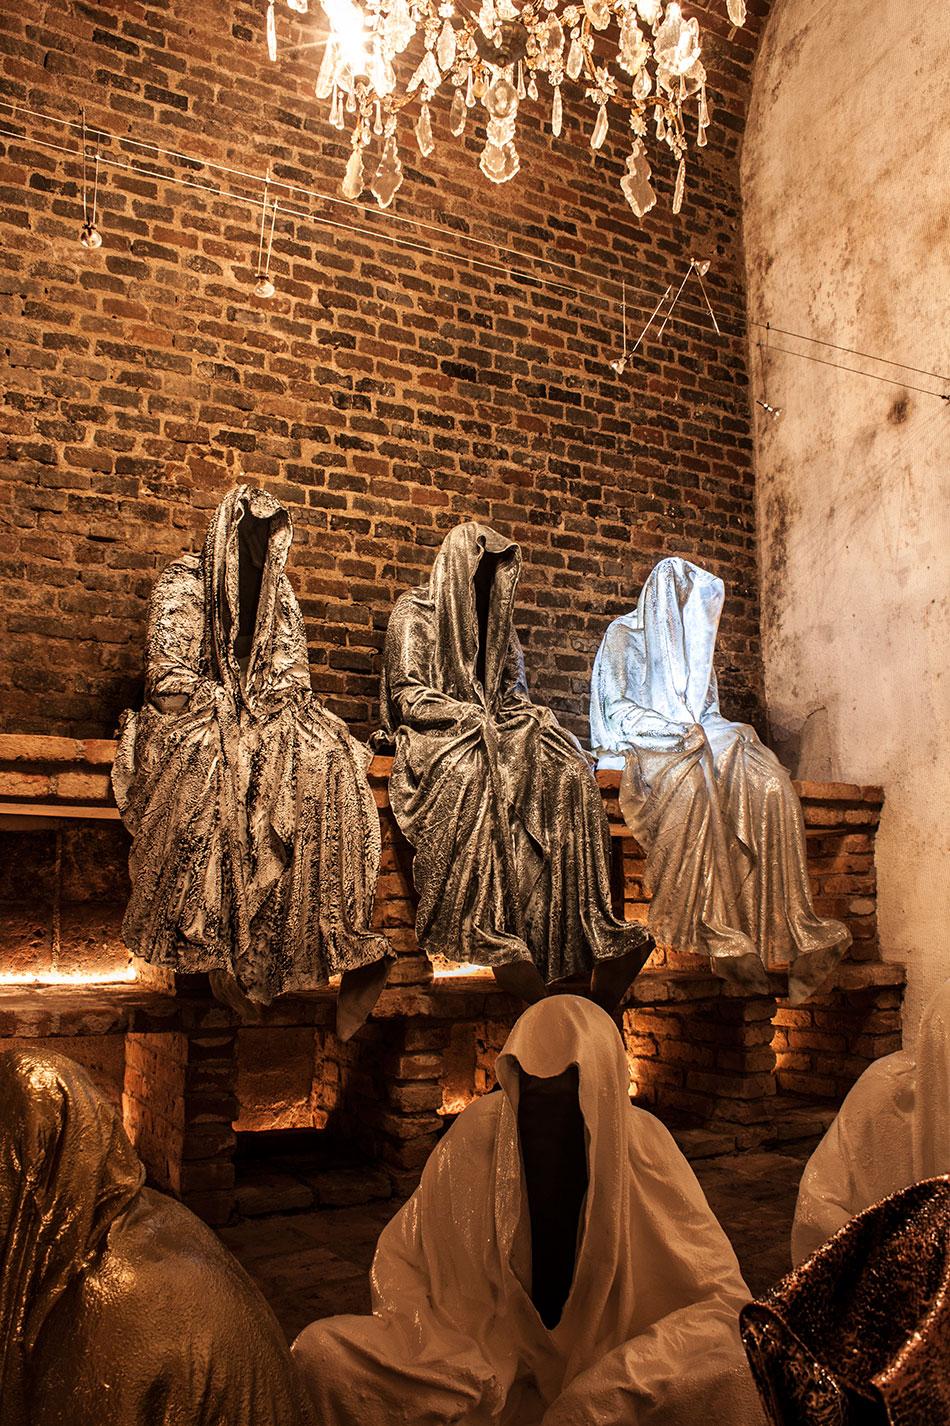 wine-cellar-galerie-artdealer--freller-guardians-of-time-manfred-kili-kielnhofer-contemporary-art-arts-light-design-sculpture-antique-show-statue-7905